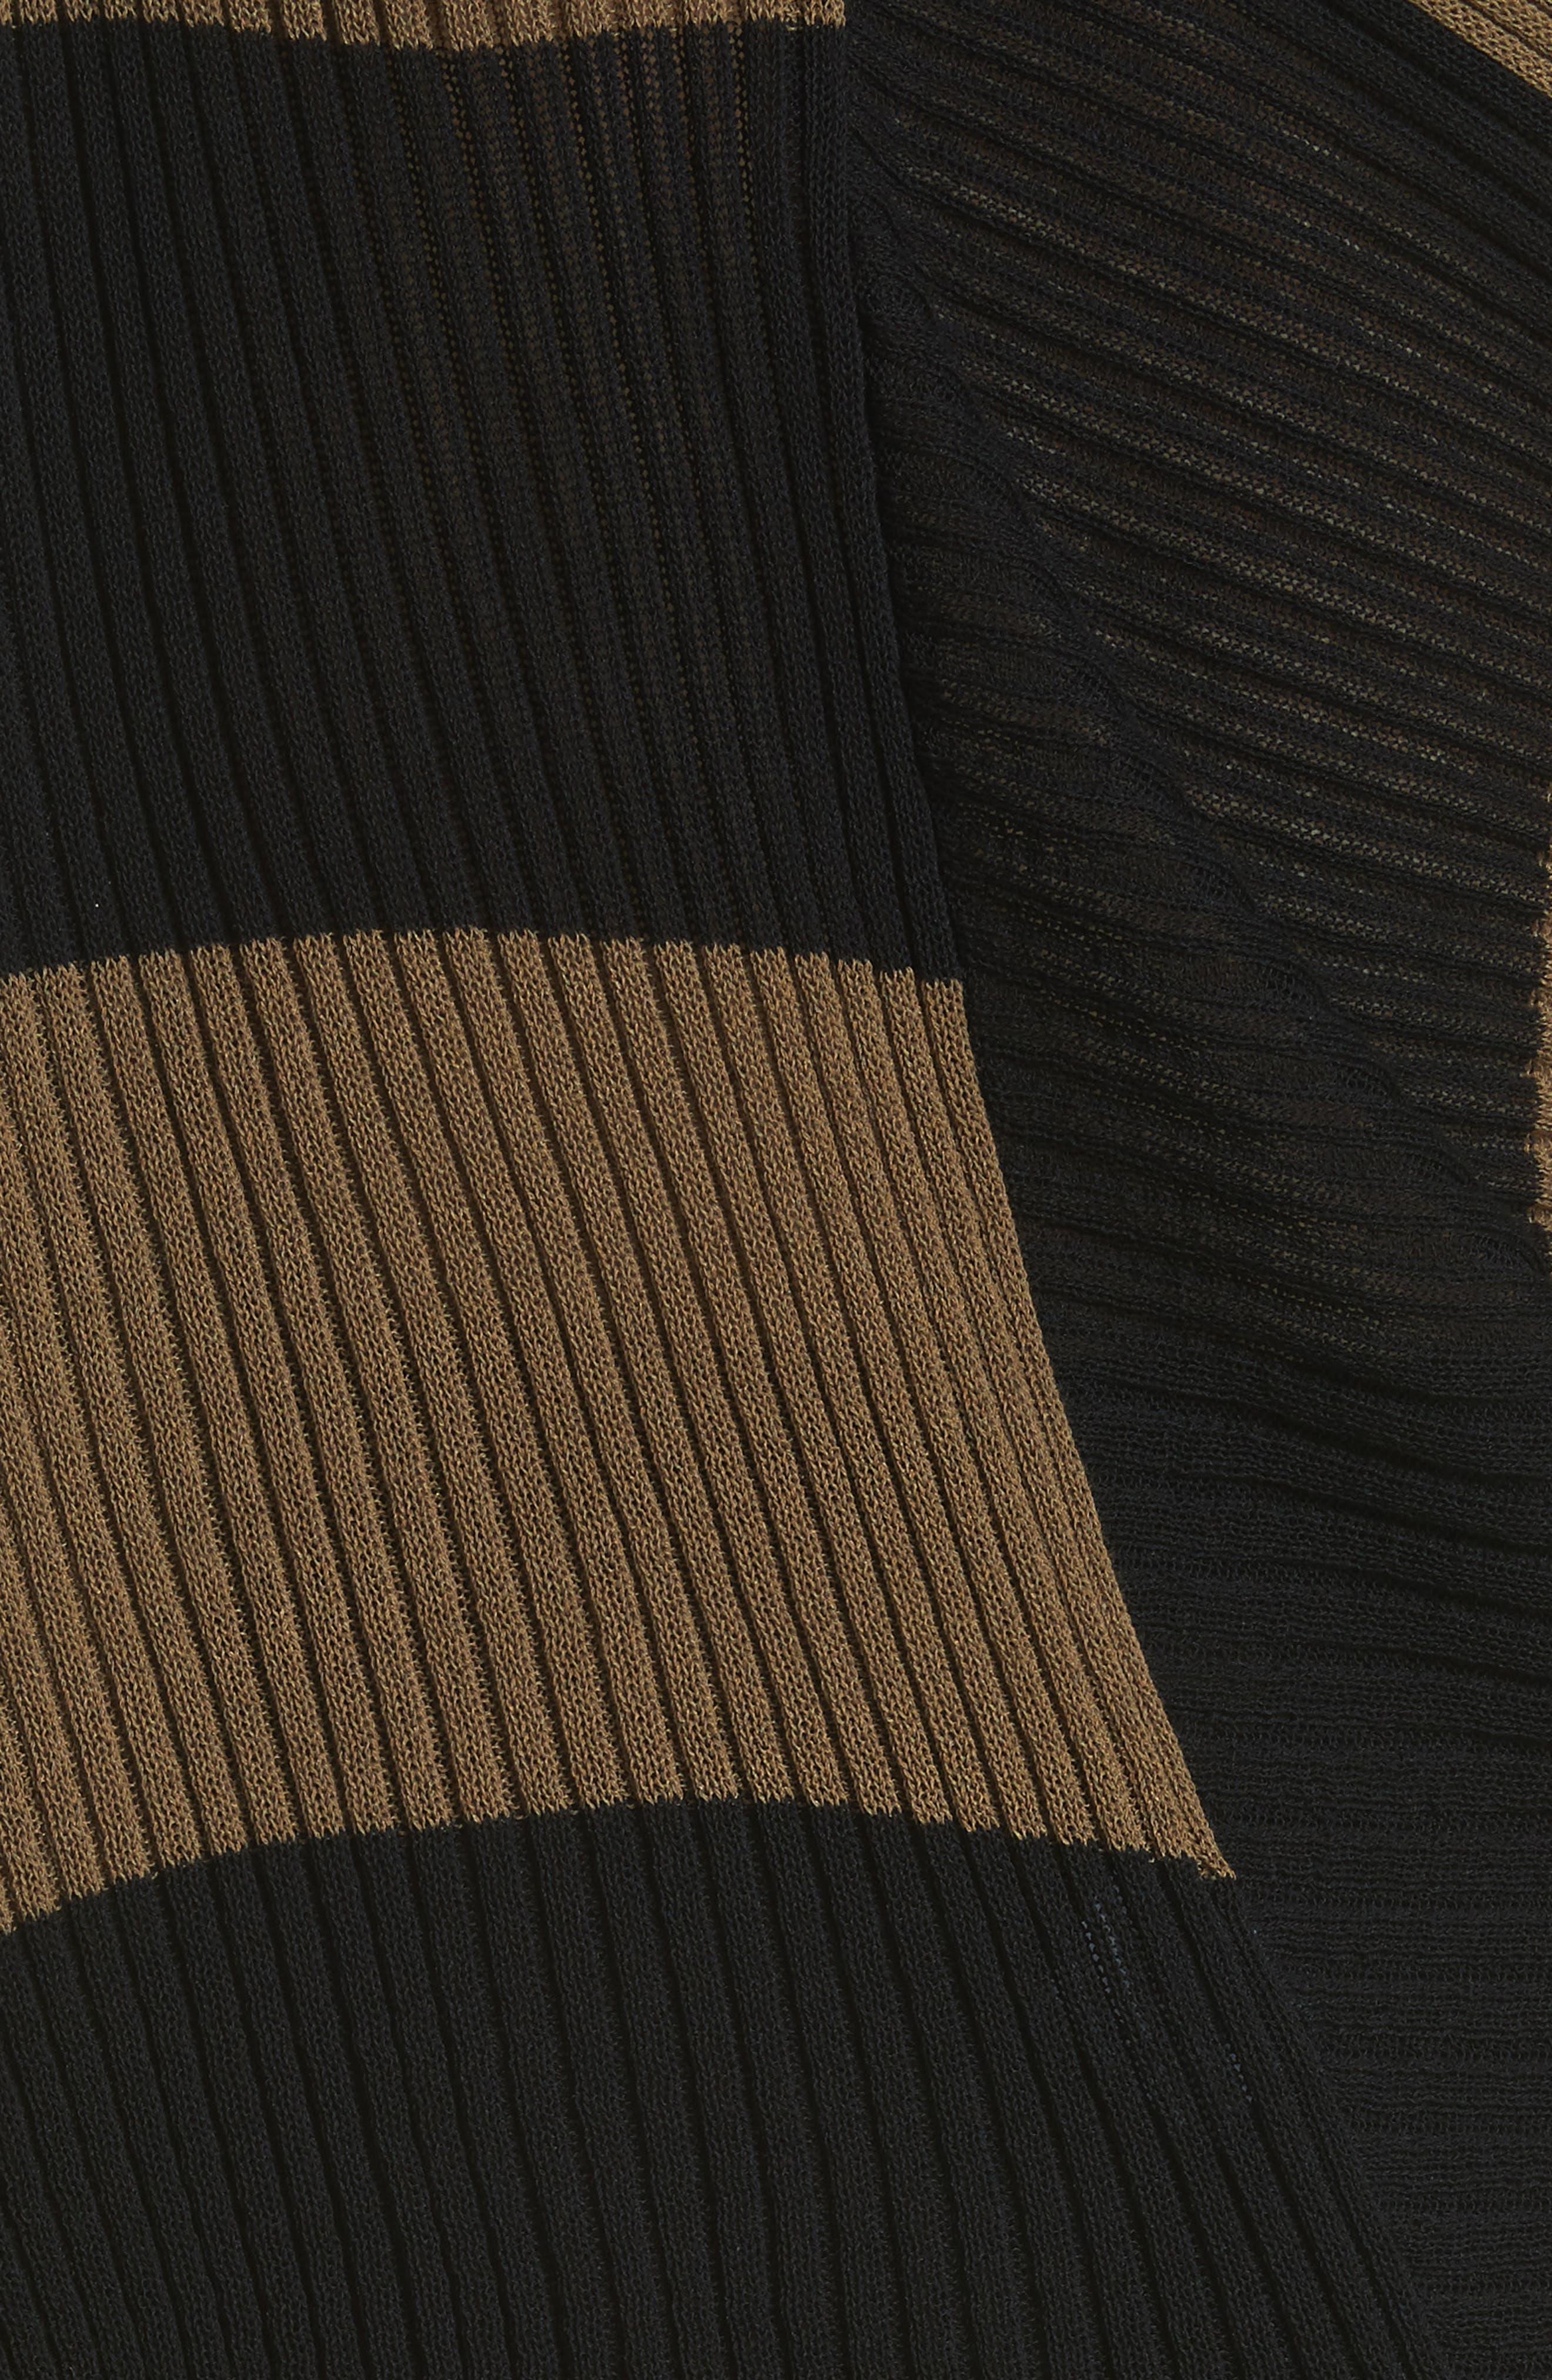 Marques'Almeida Draped One Sleeve Sweater,                             Alternate thumbnail 6, color,                             Khaki/ Black